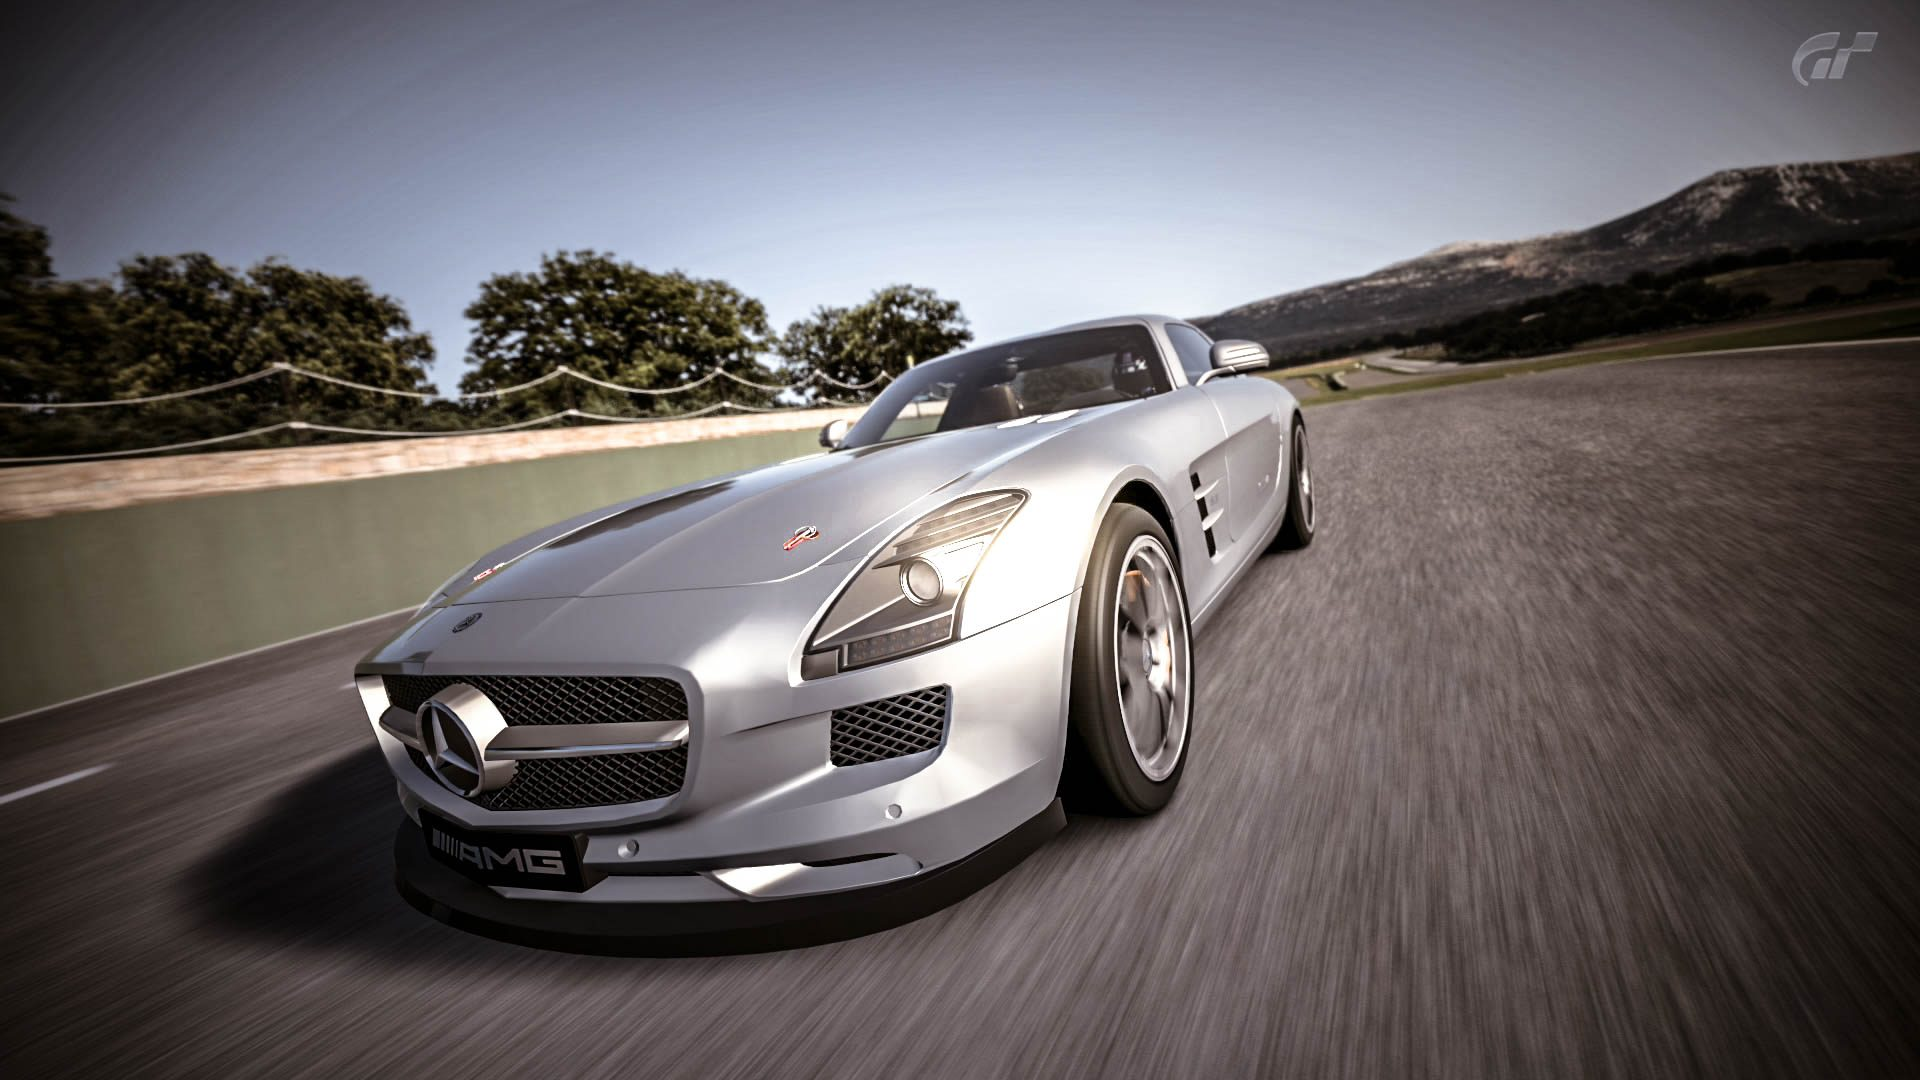 Mercedes_SLS_AMG_03.jpg